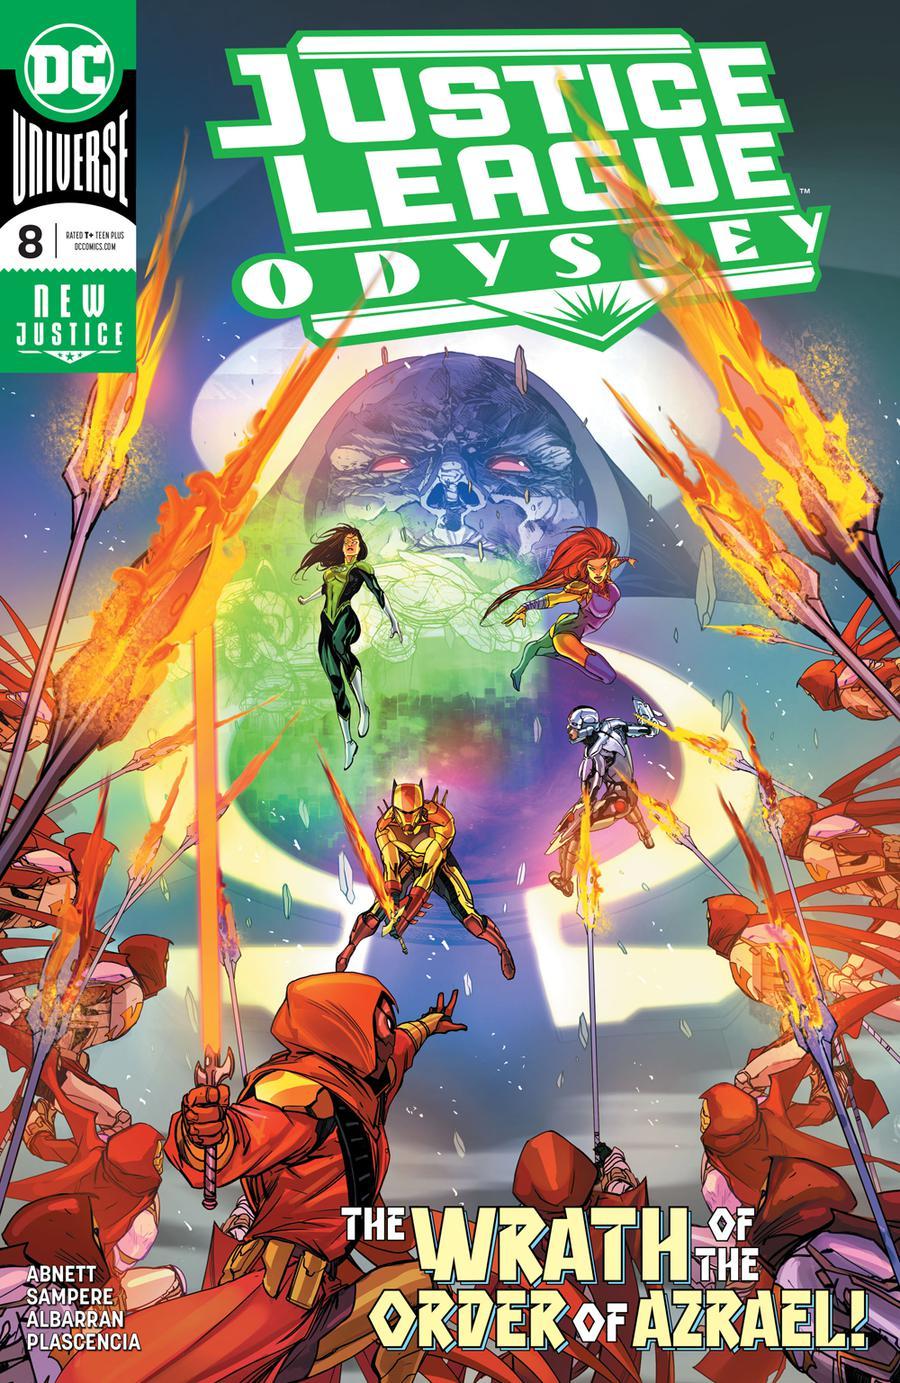 Justice League Odyssey #8 Cover A Regular Carmine Di Giandomenico Cover